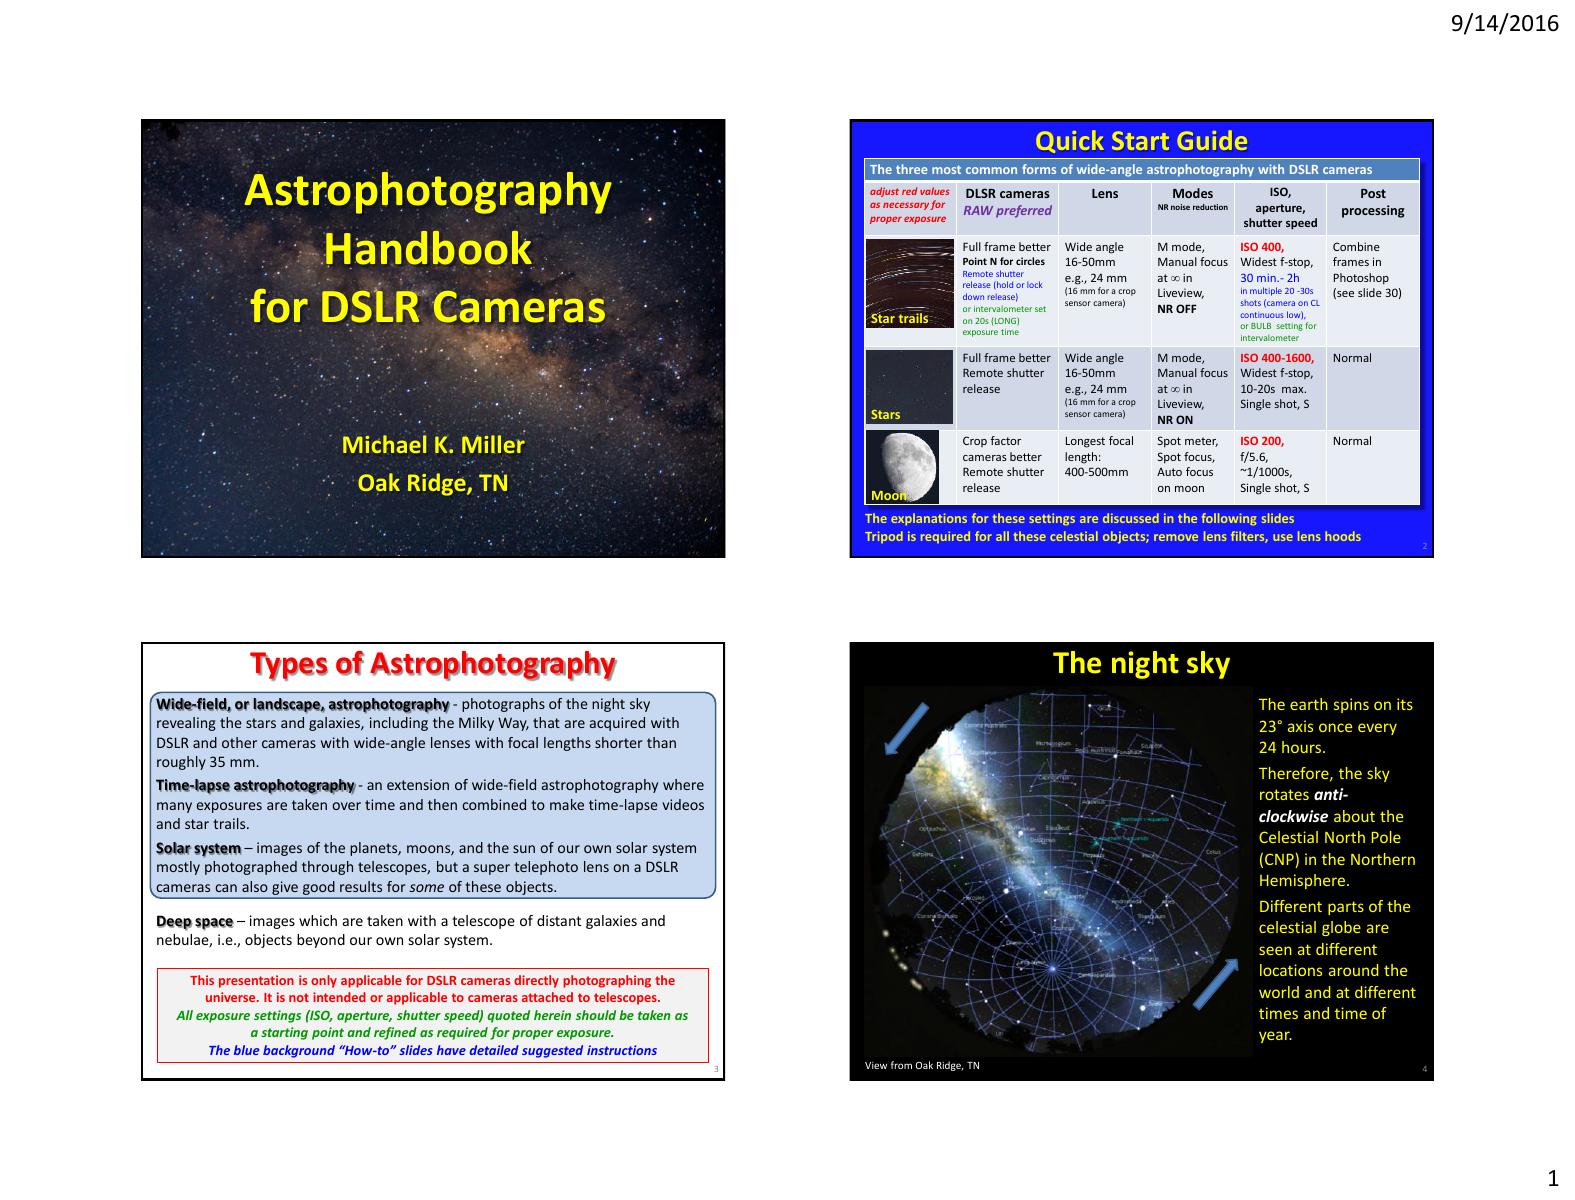 Astrophotography Handbook for DSLR Cameras